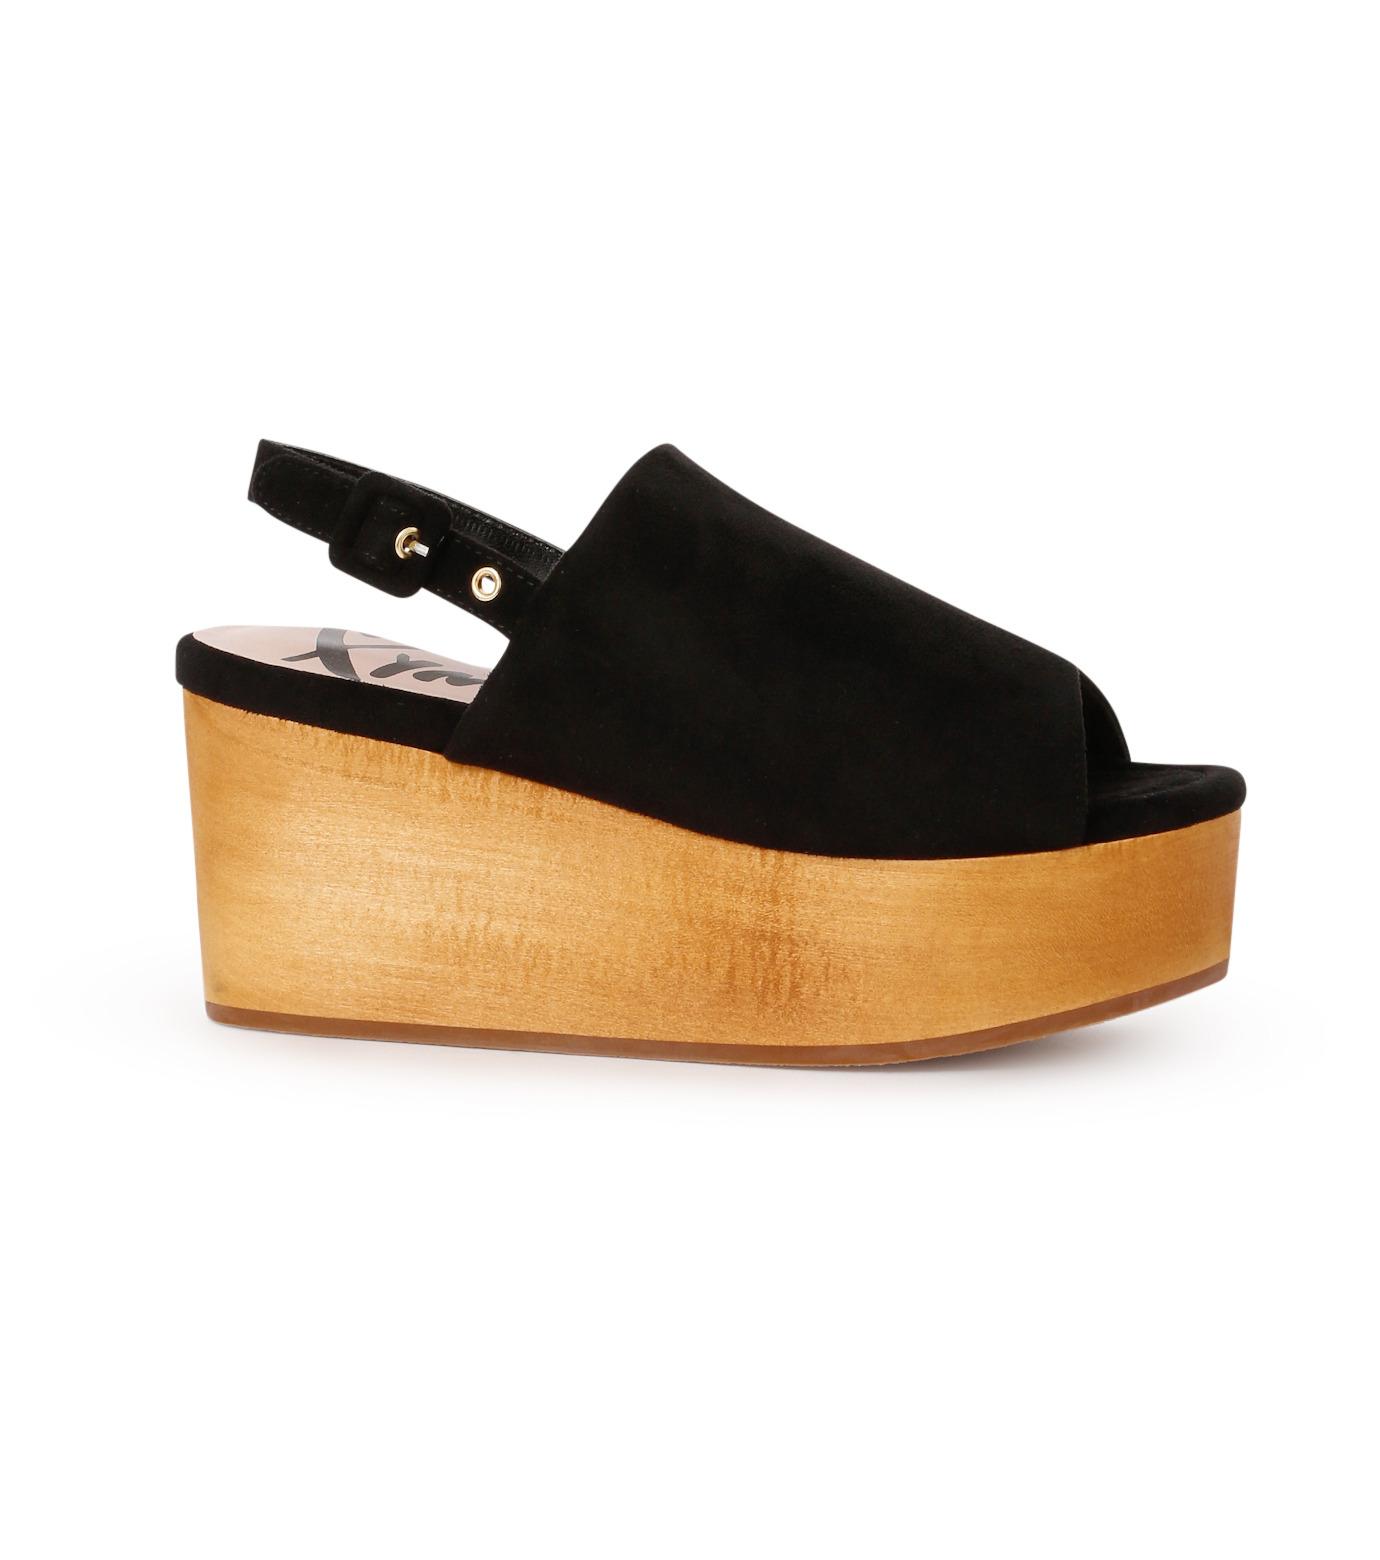 Myneself(マインセルフ)のFake Suede Sandal-BLACK(フラットシューズ/Flat shoes)-MSS7-0010-13 拡大詳細画像1